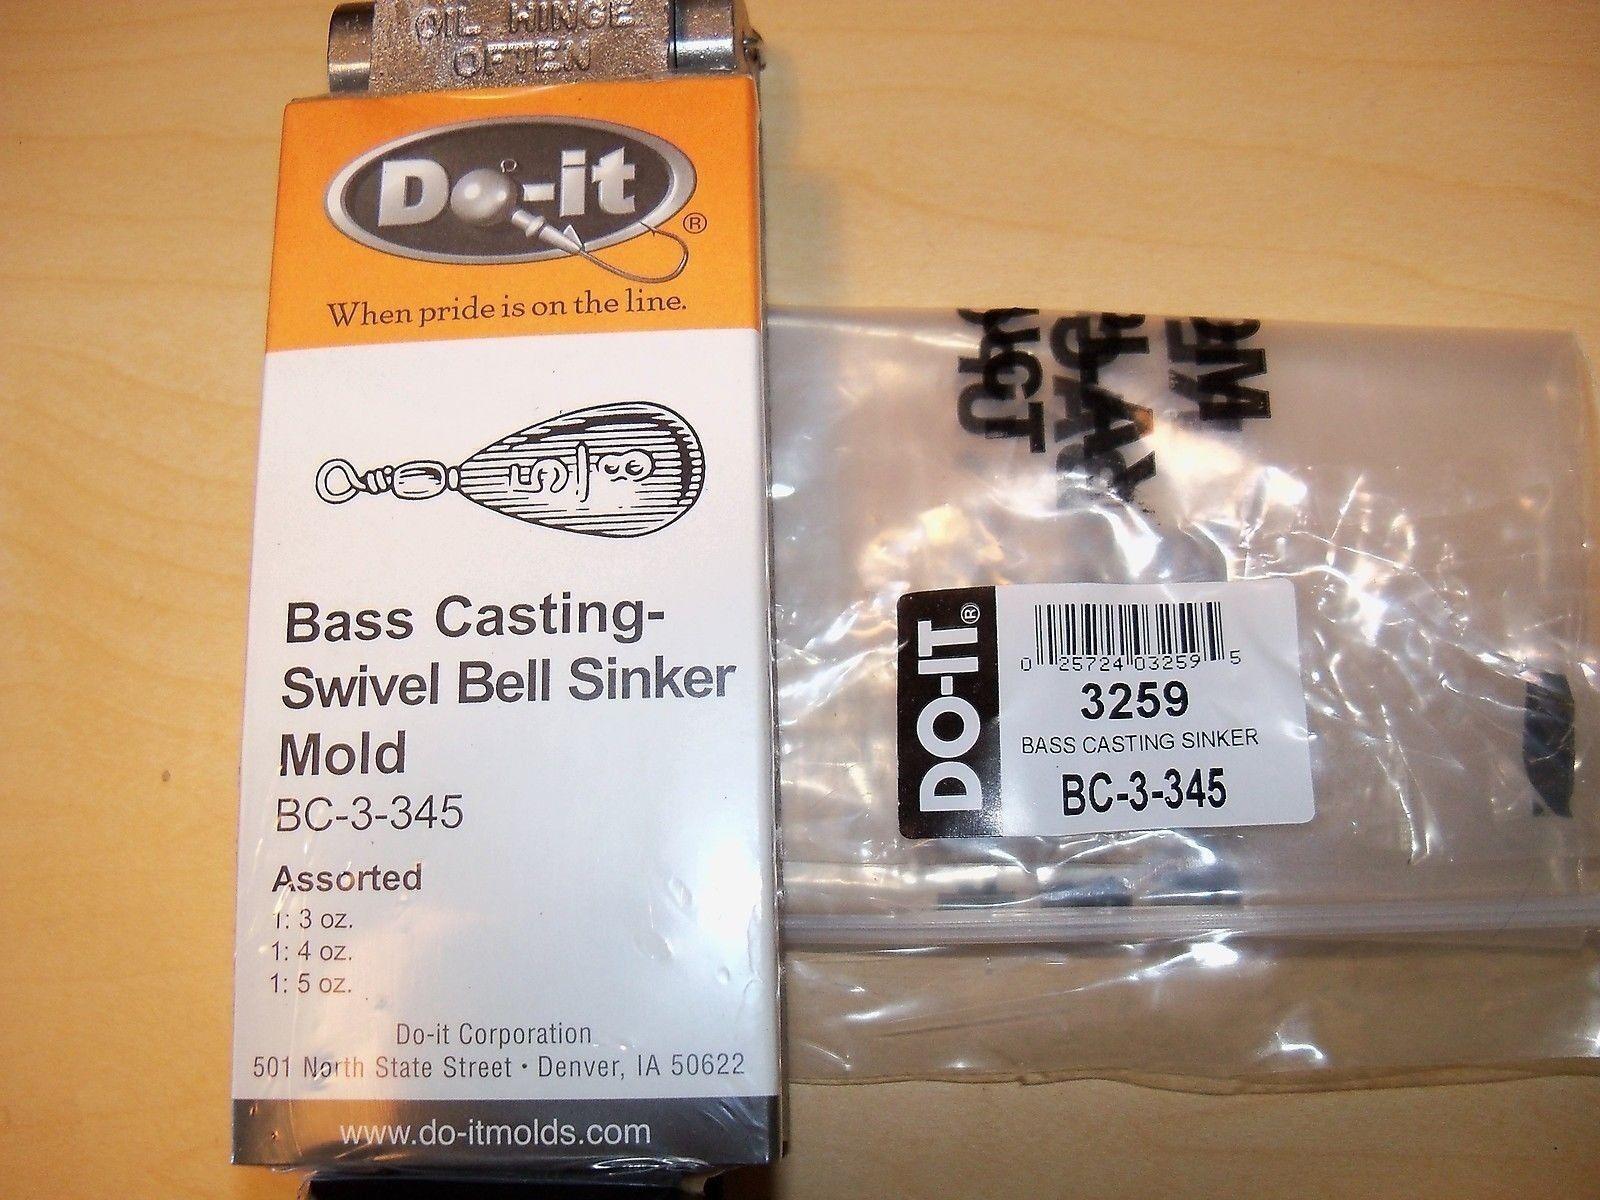 3259 NEW DO-IT SINKER MOLD BASS CASTING SZ 3, 4, 5 oz., BC-3-345